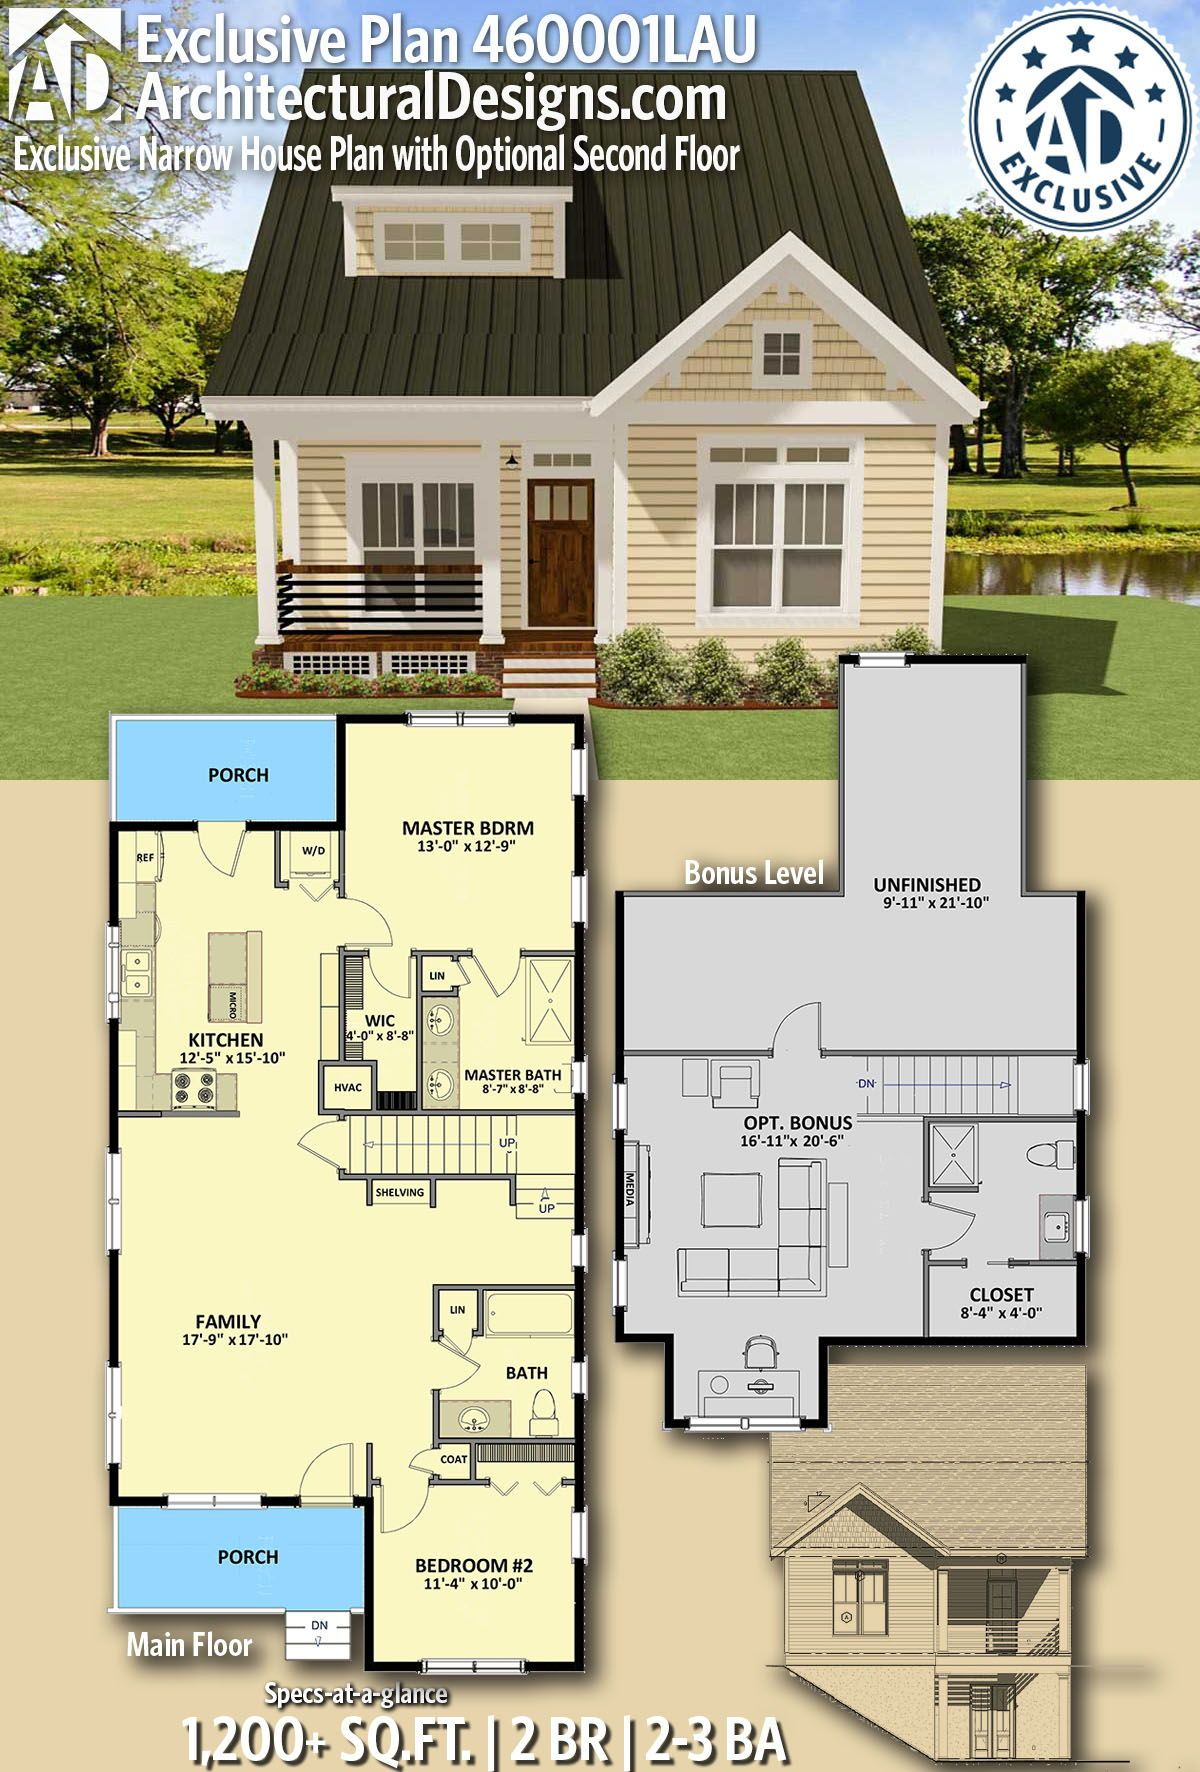 Plan 460001la Exclusive Narrow House Plan With Optional Second Floor Narrow House Plans Small House Floor Plans Narrow House